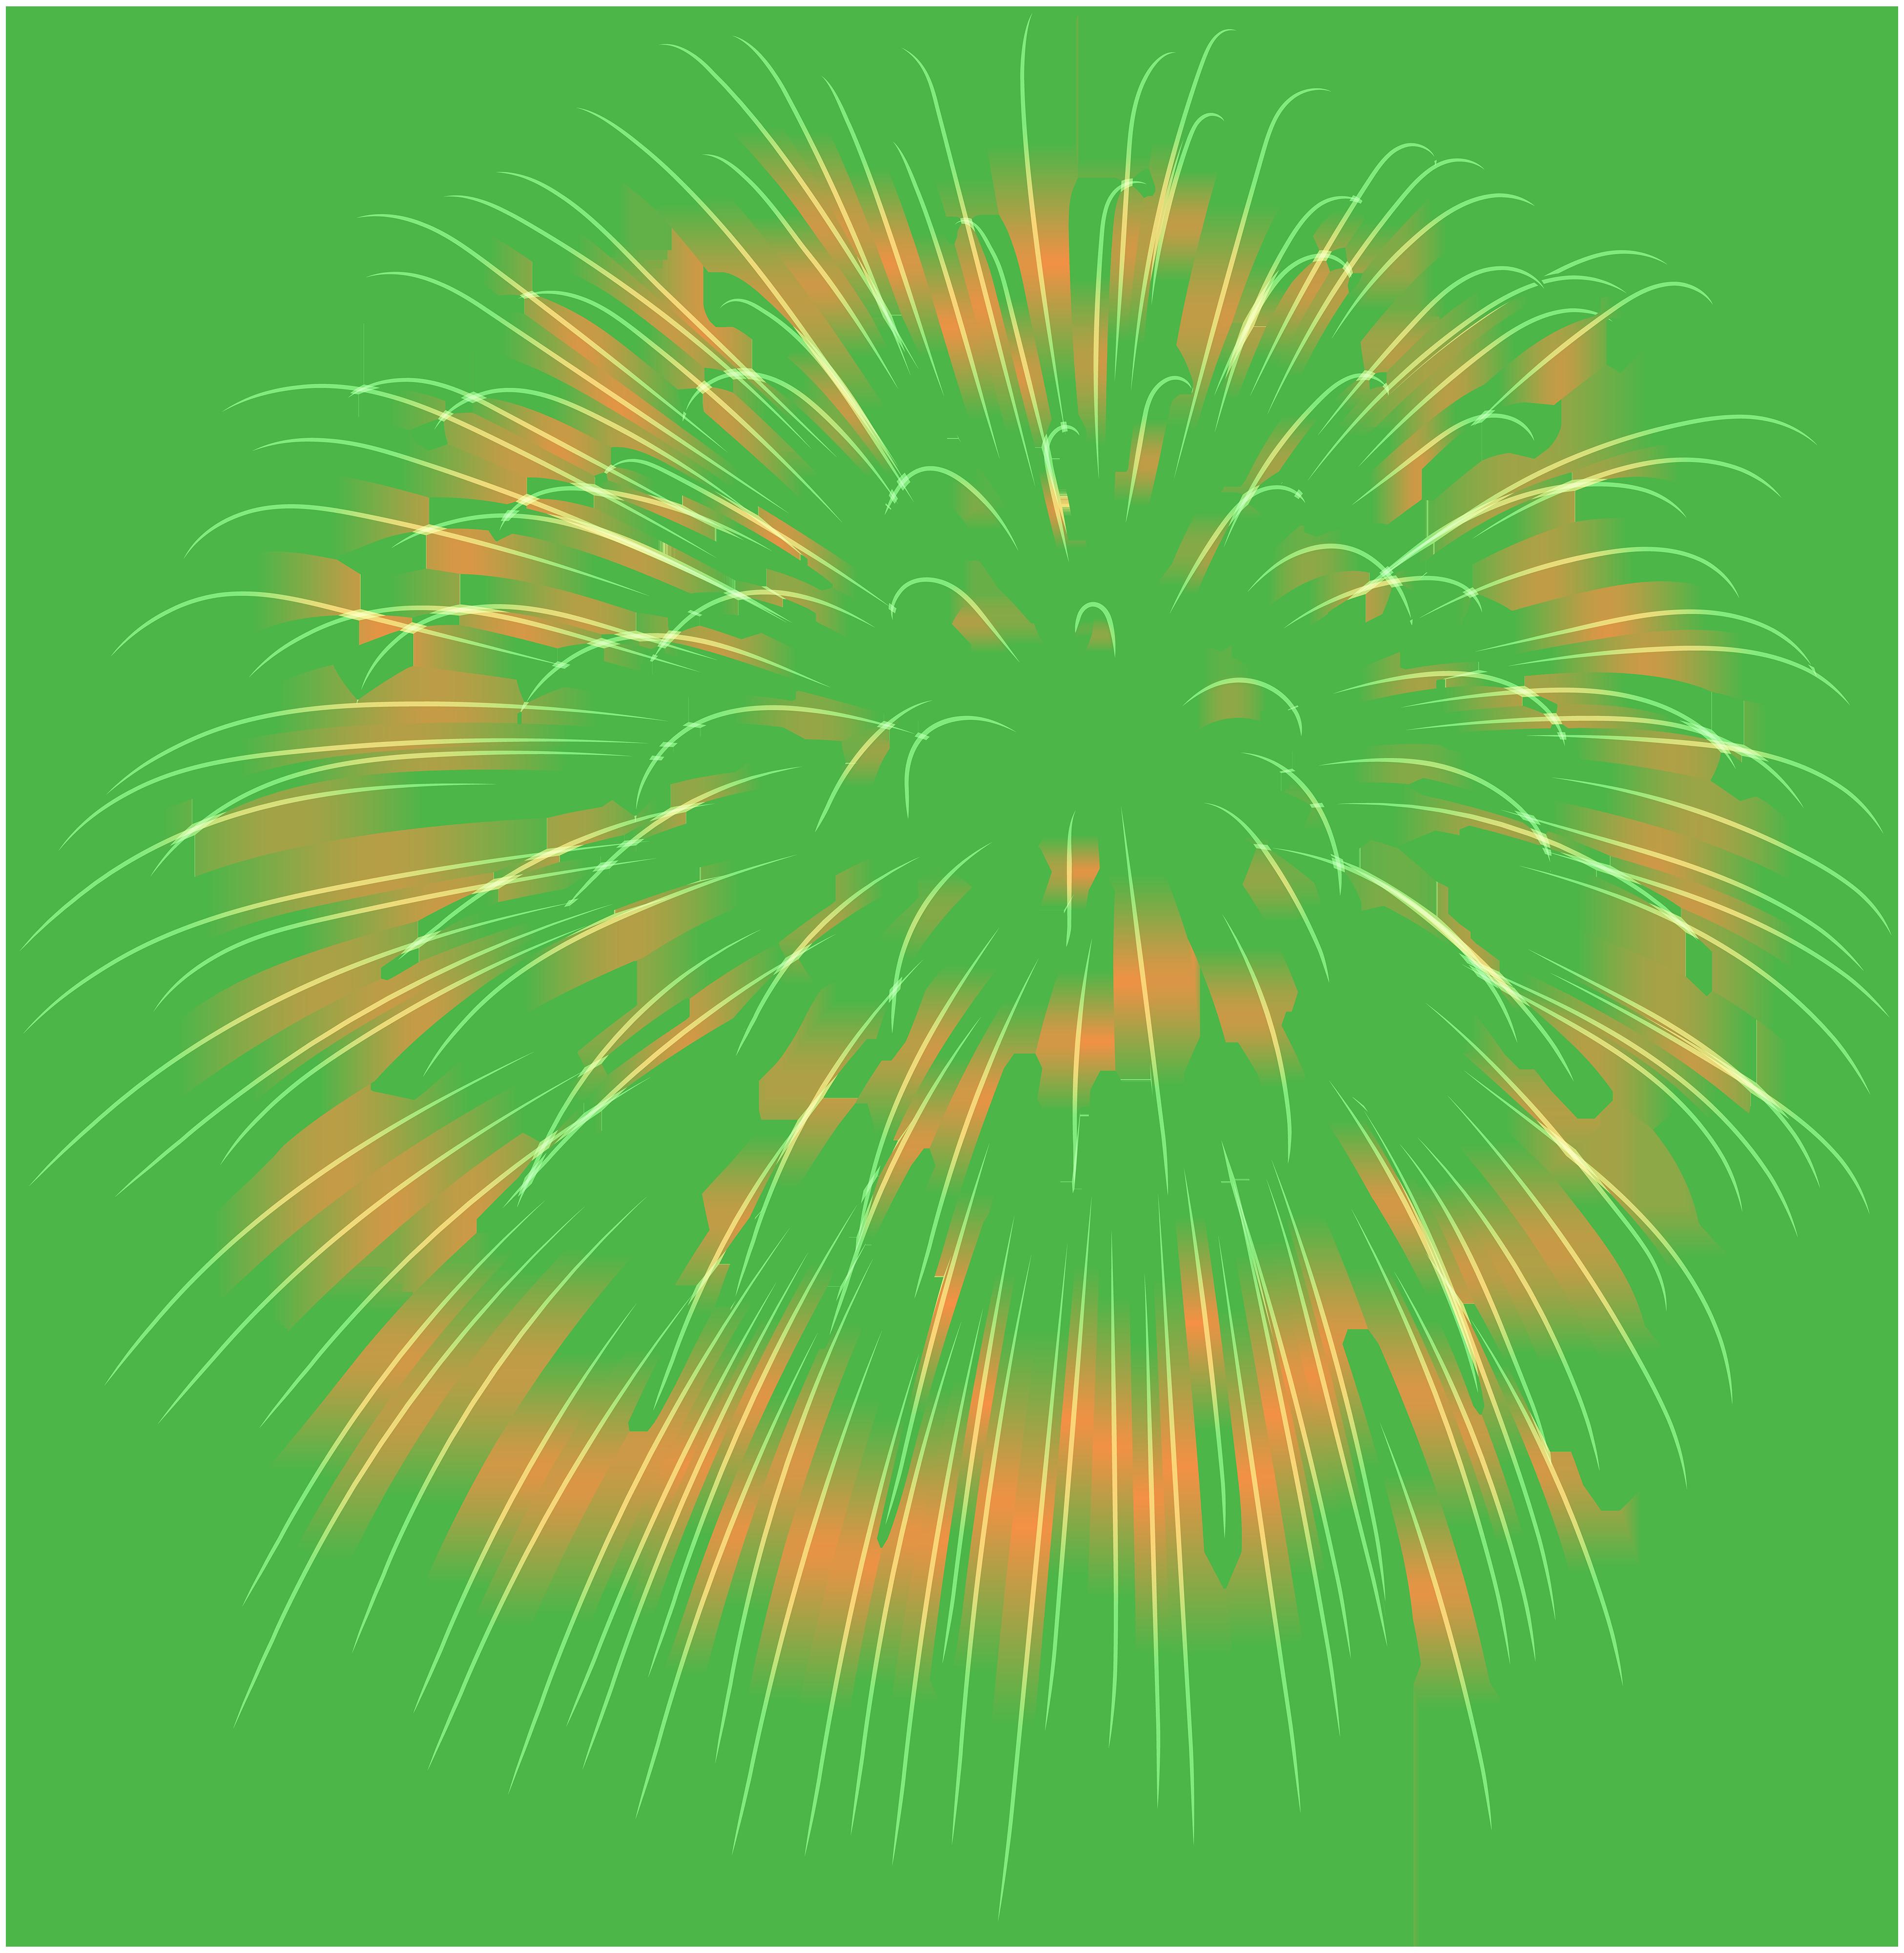 Firework green png image. Clipart fireworks transparent background